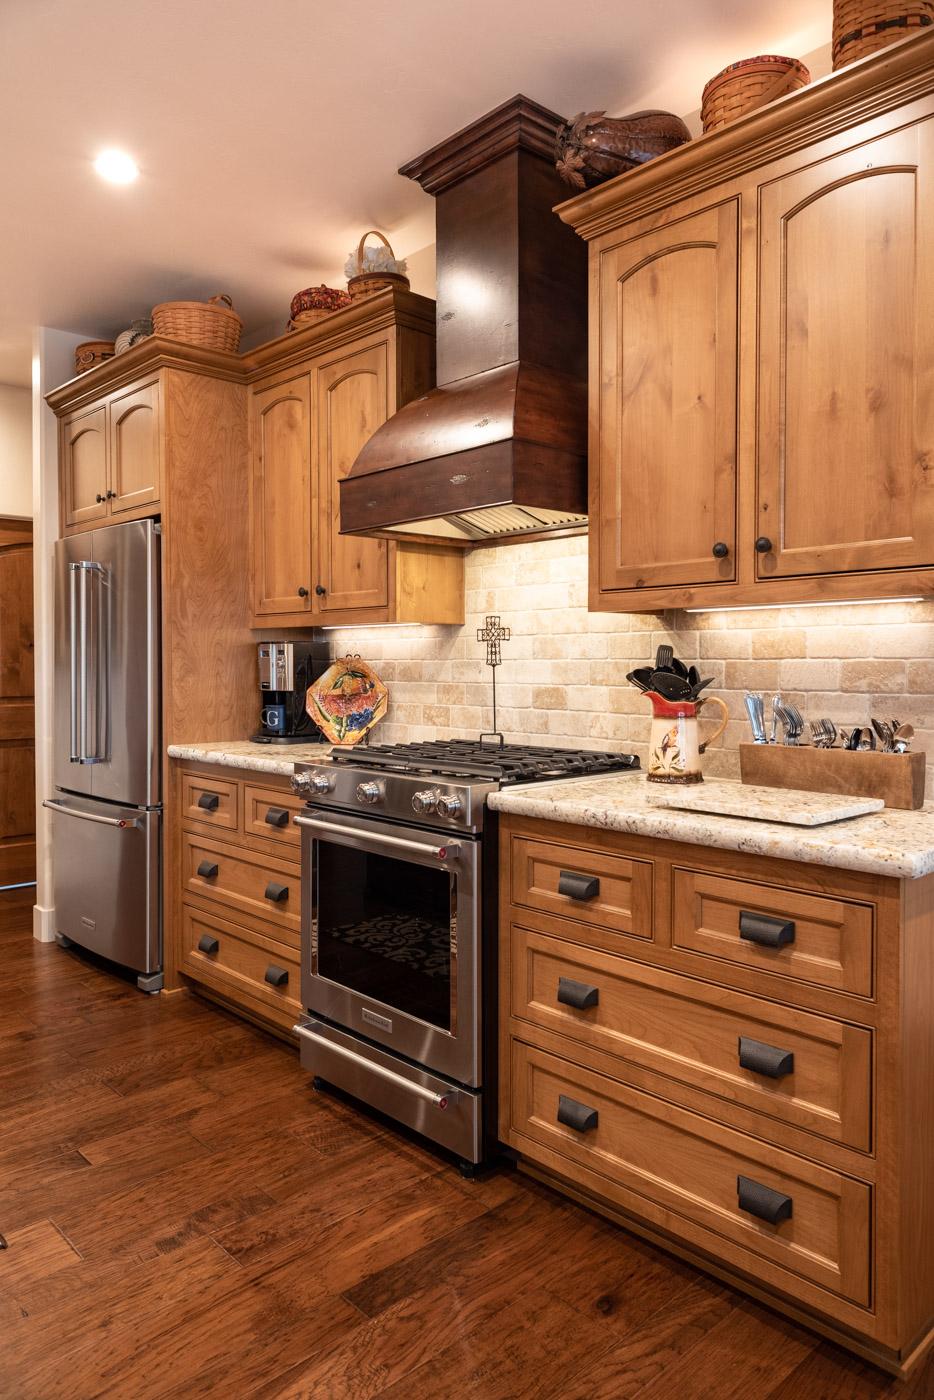 Alder Wood Kitchen Cabinets Tuscan Artisan custom kitchen and bathroom cabinets in Atascadero